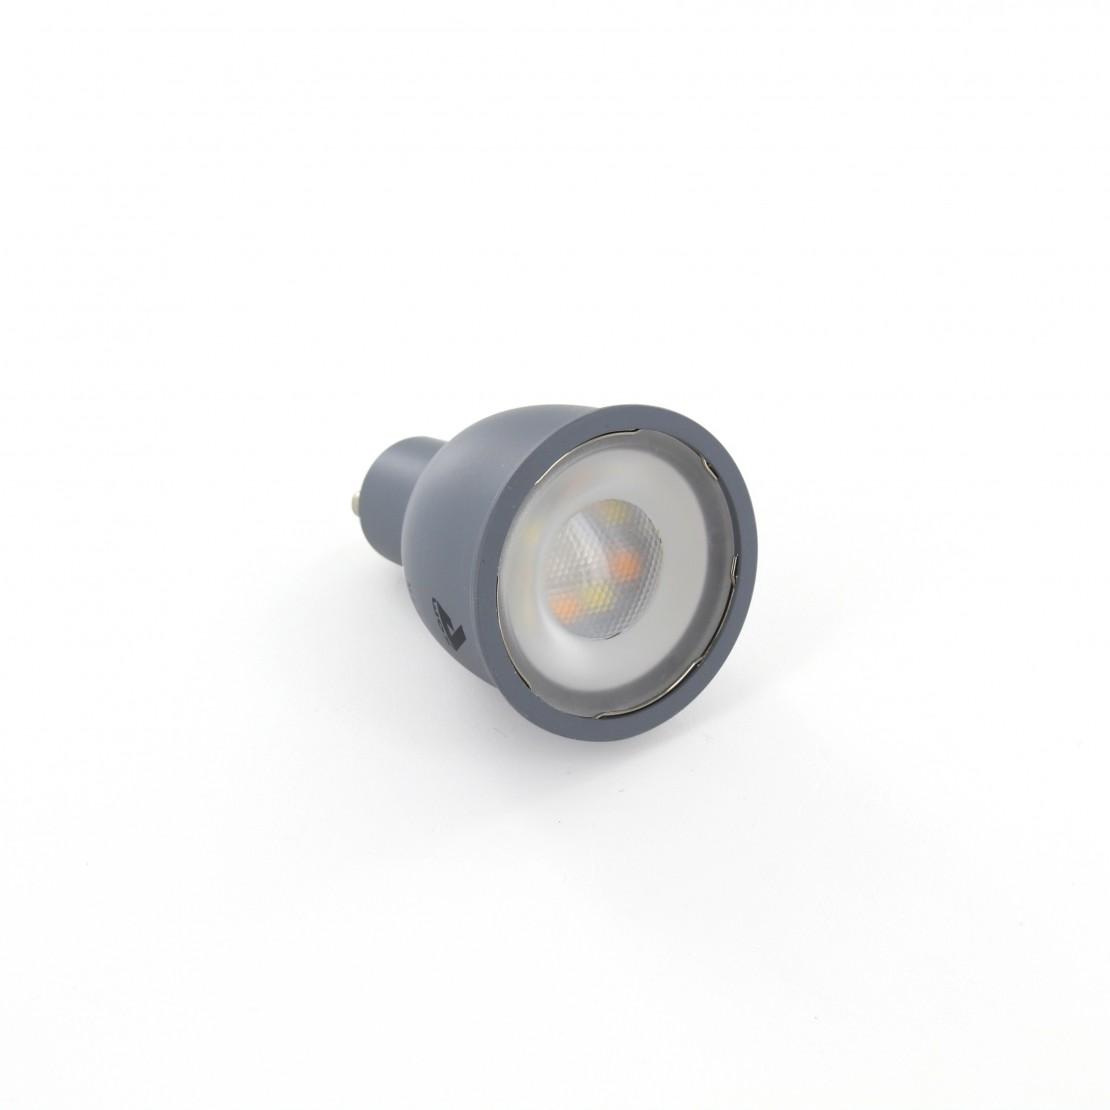 SmartLIGHT - lâmpada GU10 de cor, Buetooth Mesh